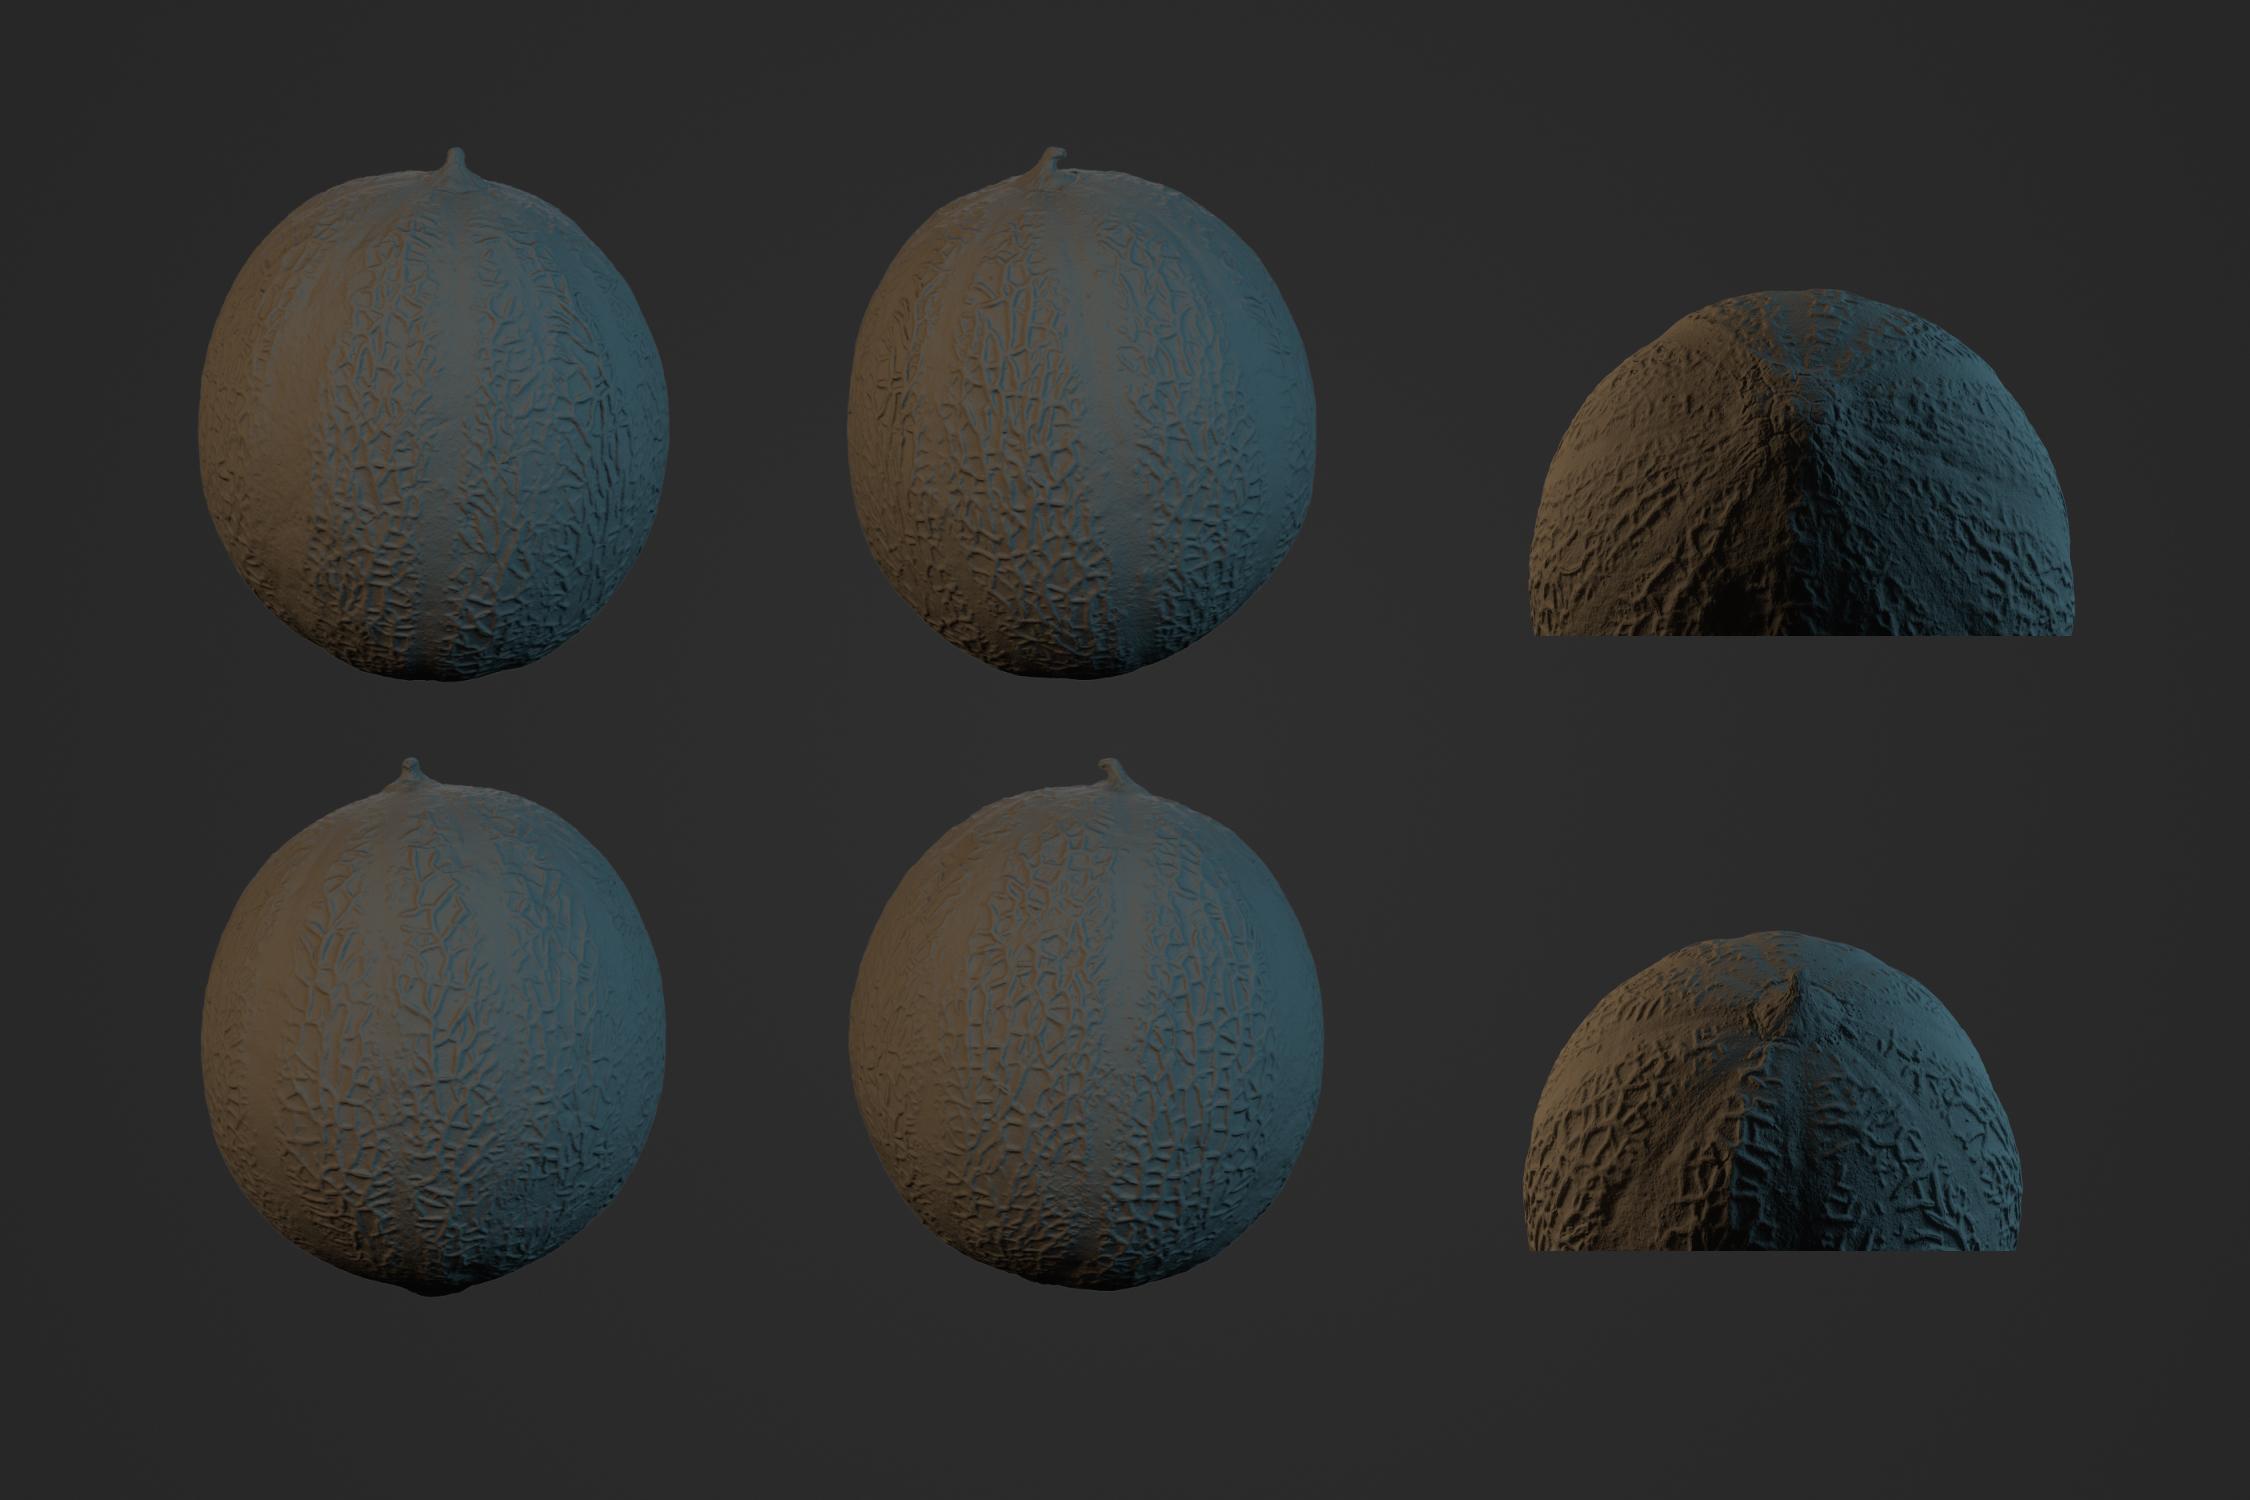 Melon_1_0.jpg